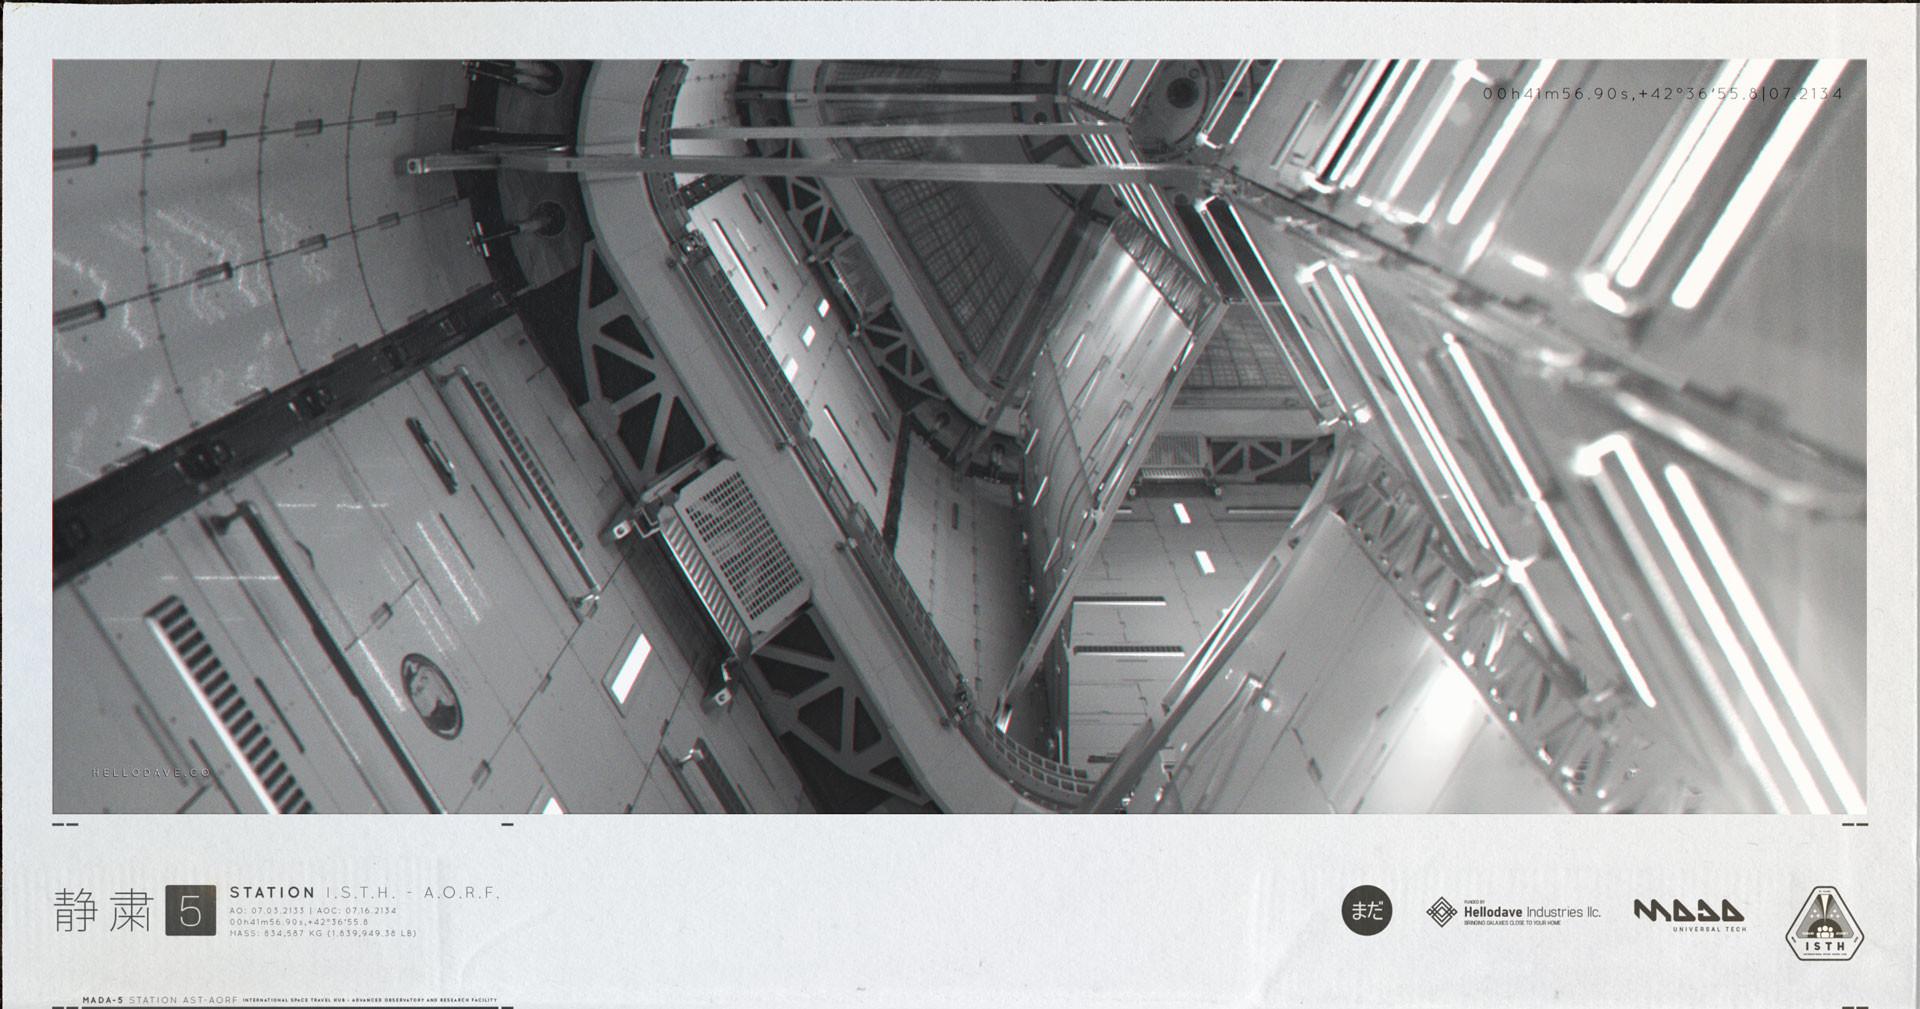 Davison carvalho station horizontal mon 01a